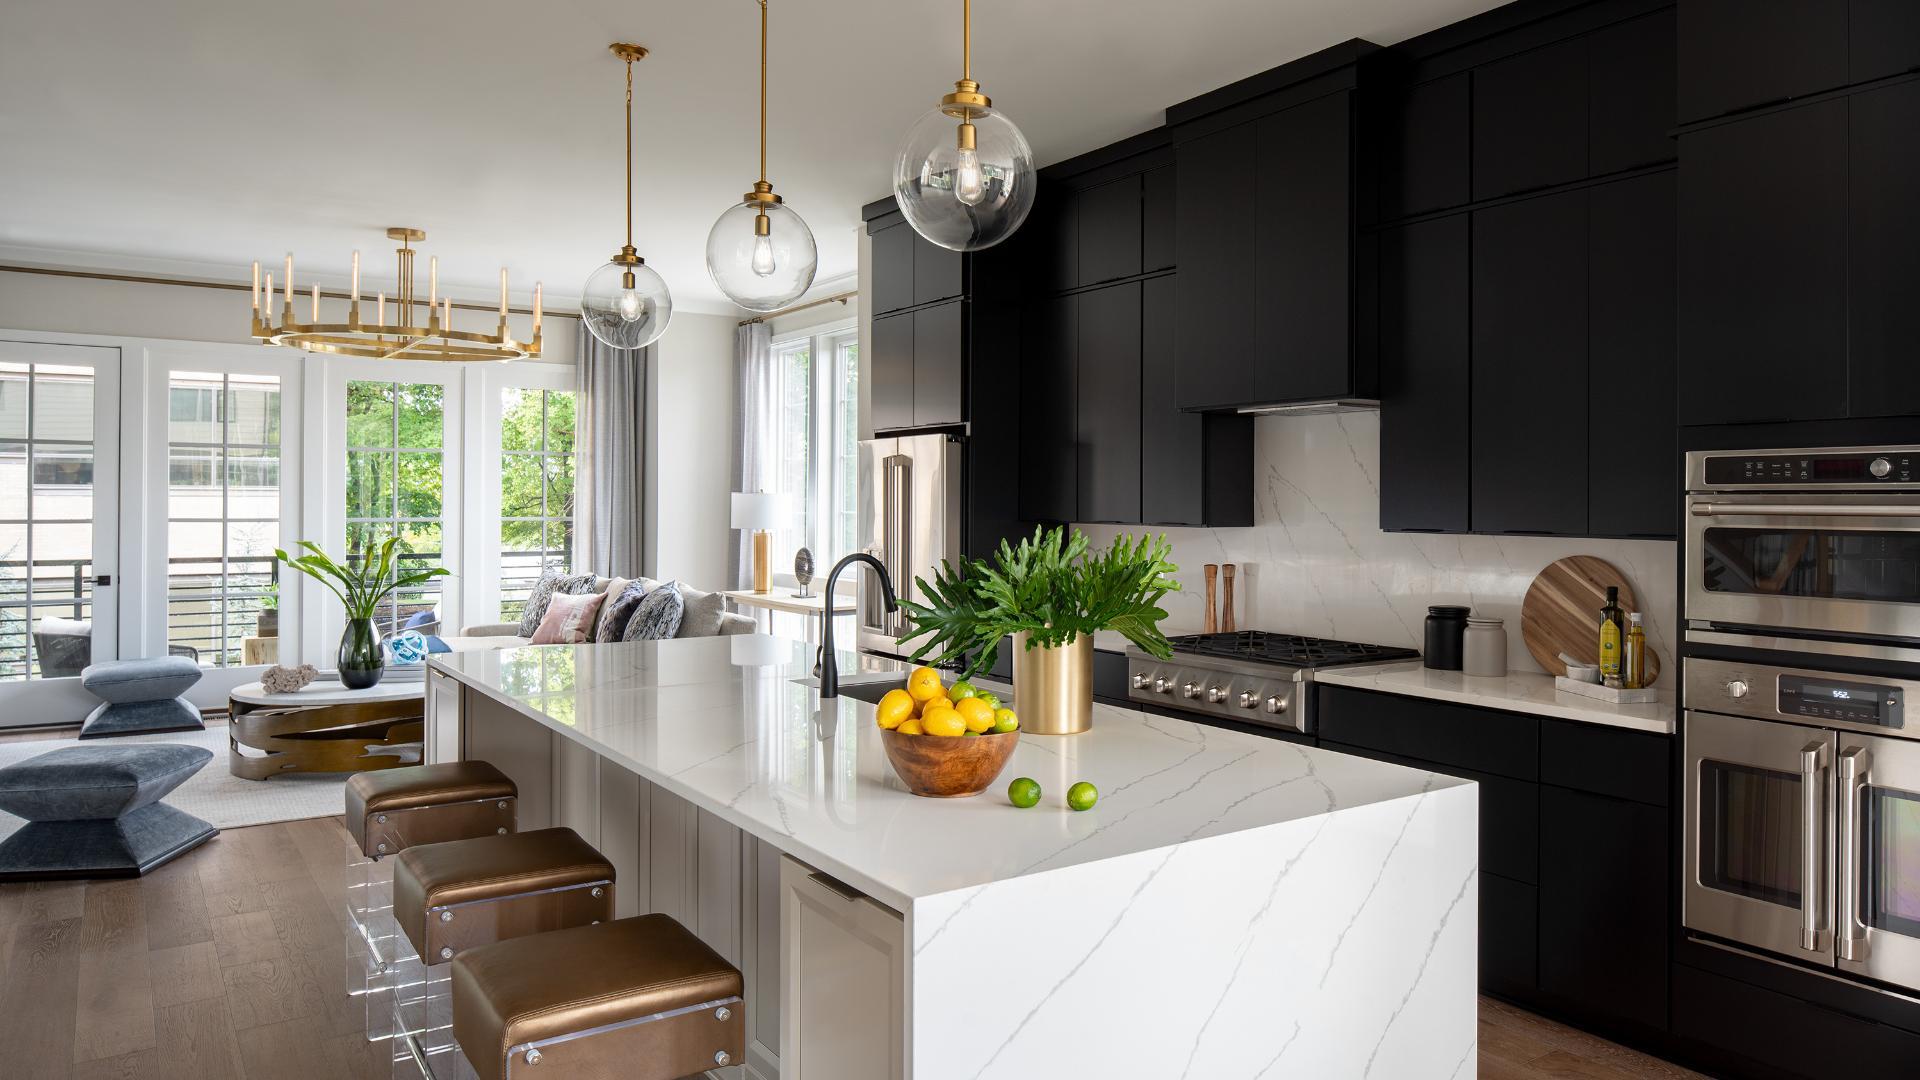 Expansive kitchens